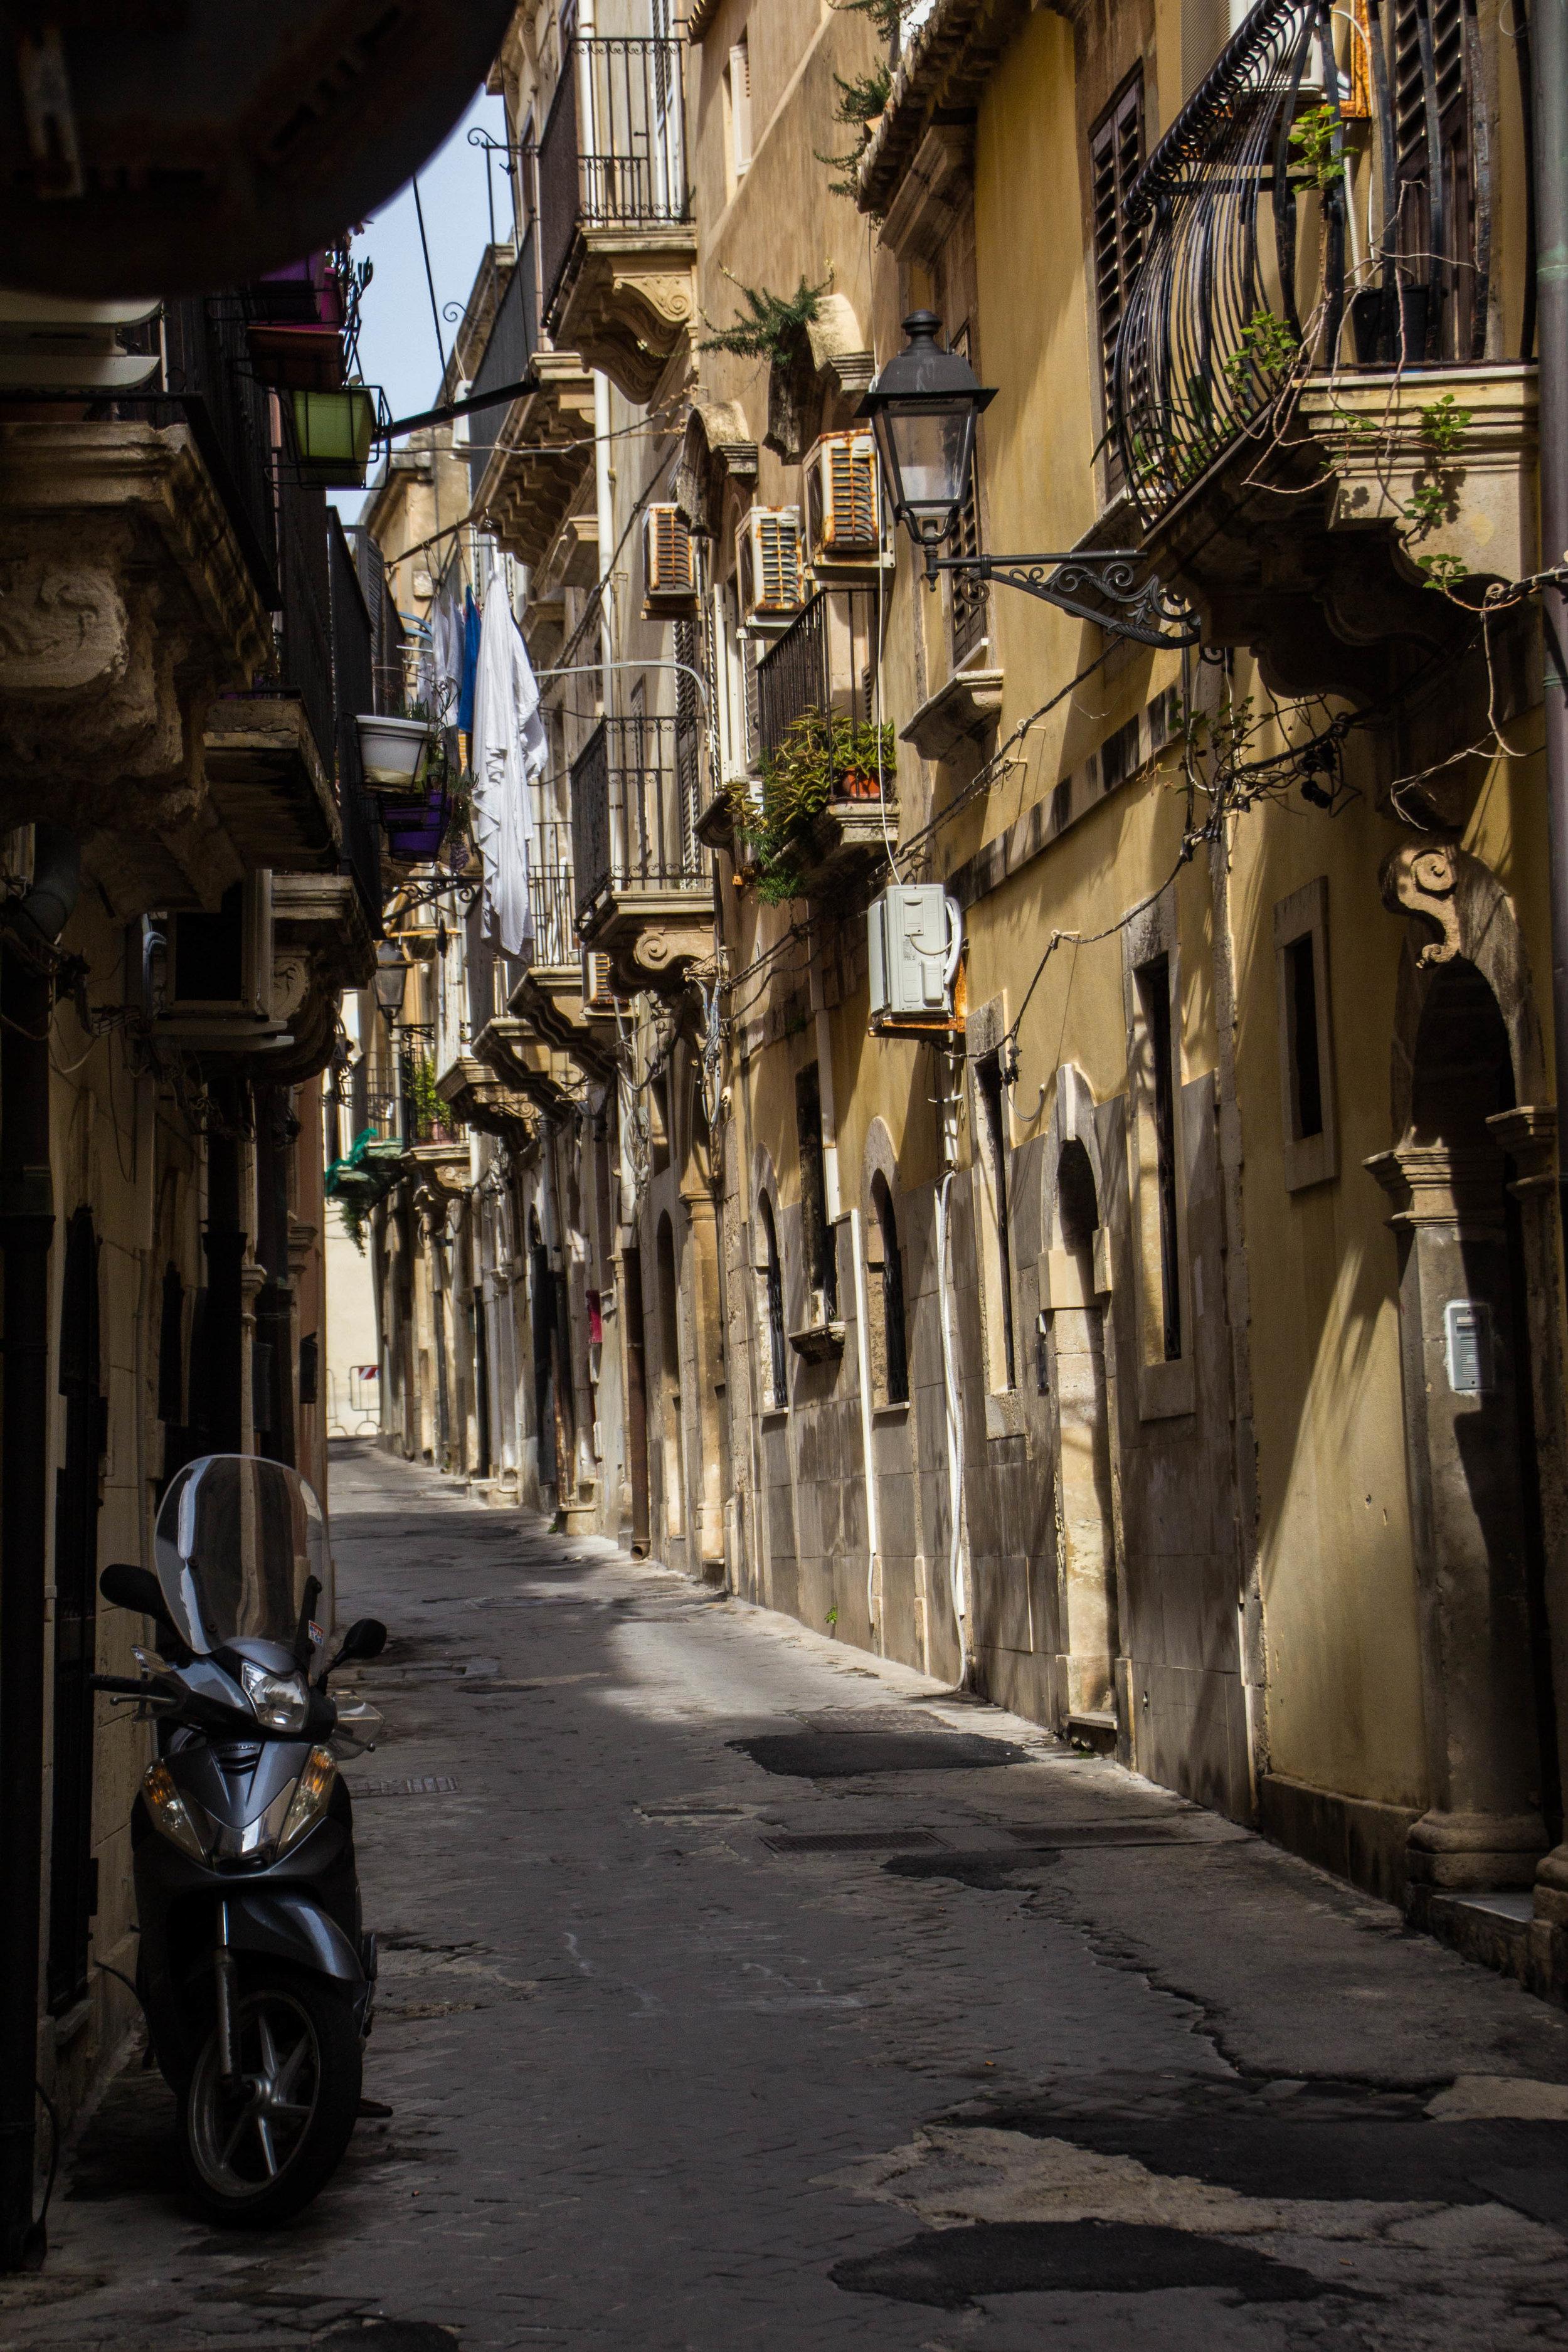 streets-ortygia-syracuse-sicily-29.jpg